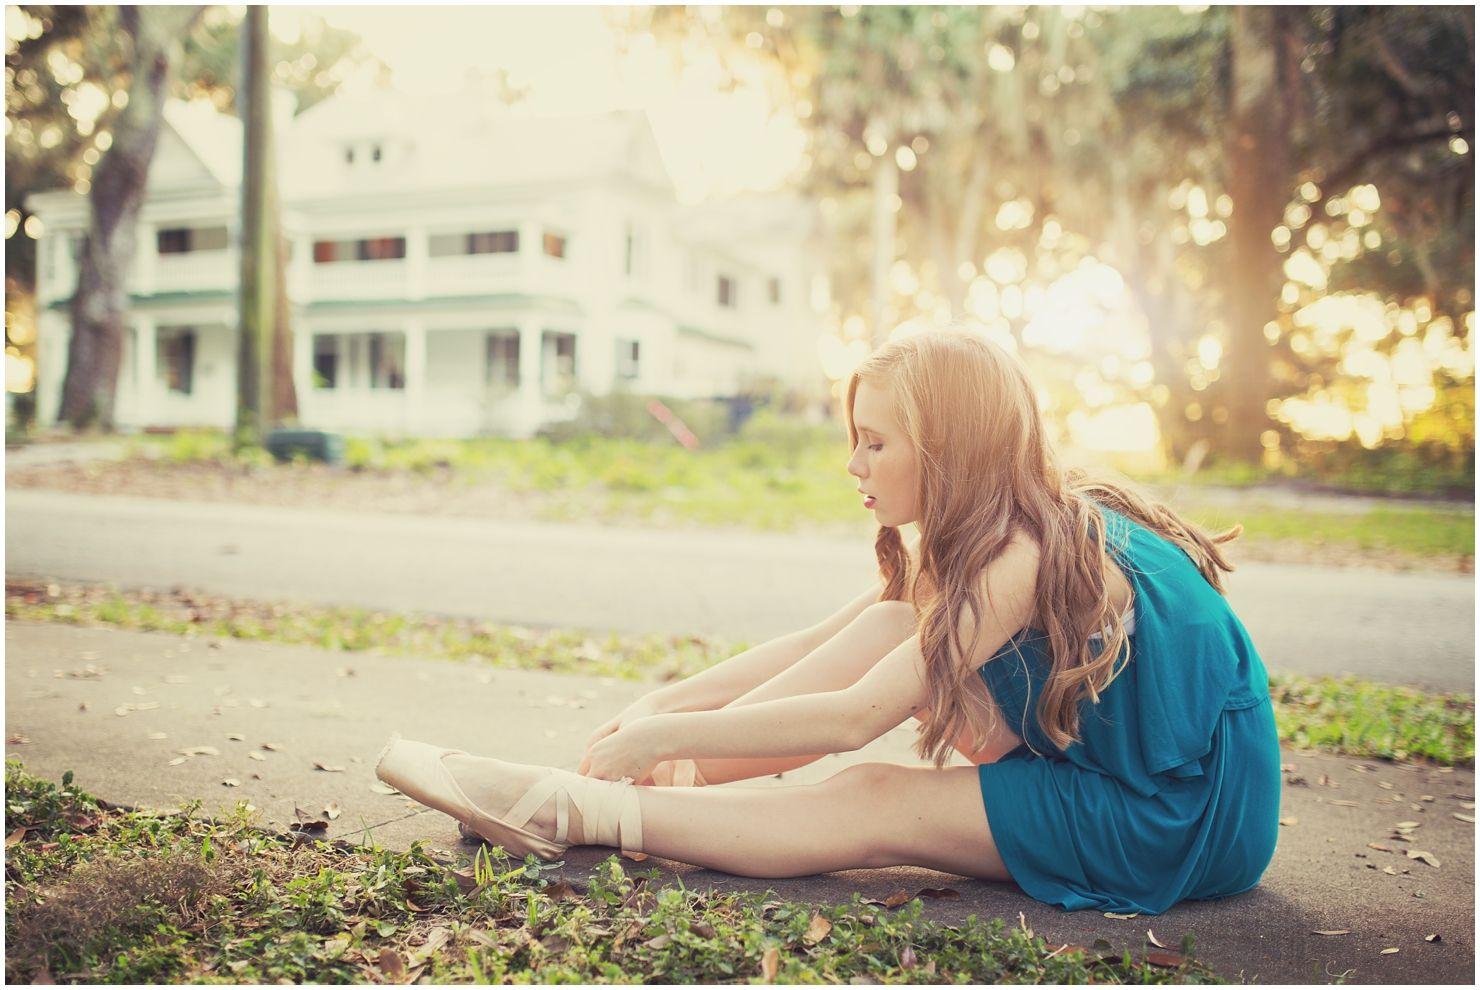 Florida Dance Photography // Sunset Ballet » Hampshire Photographer